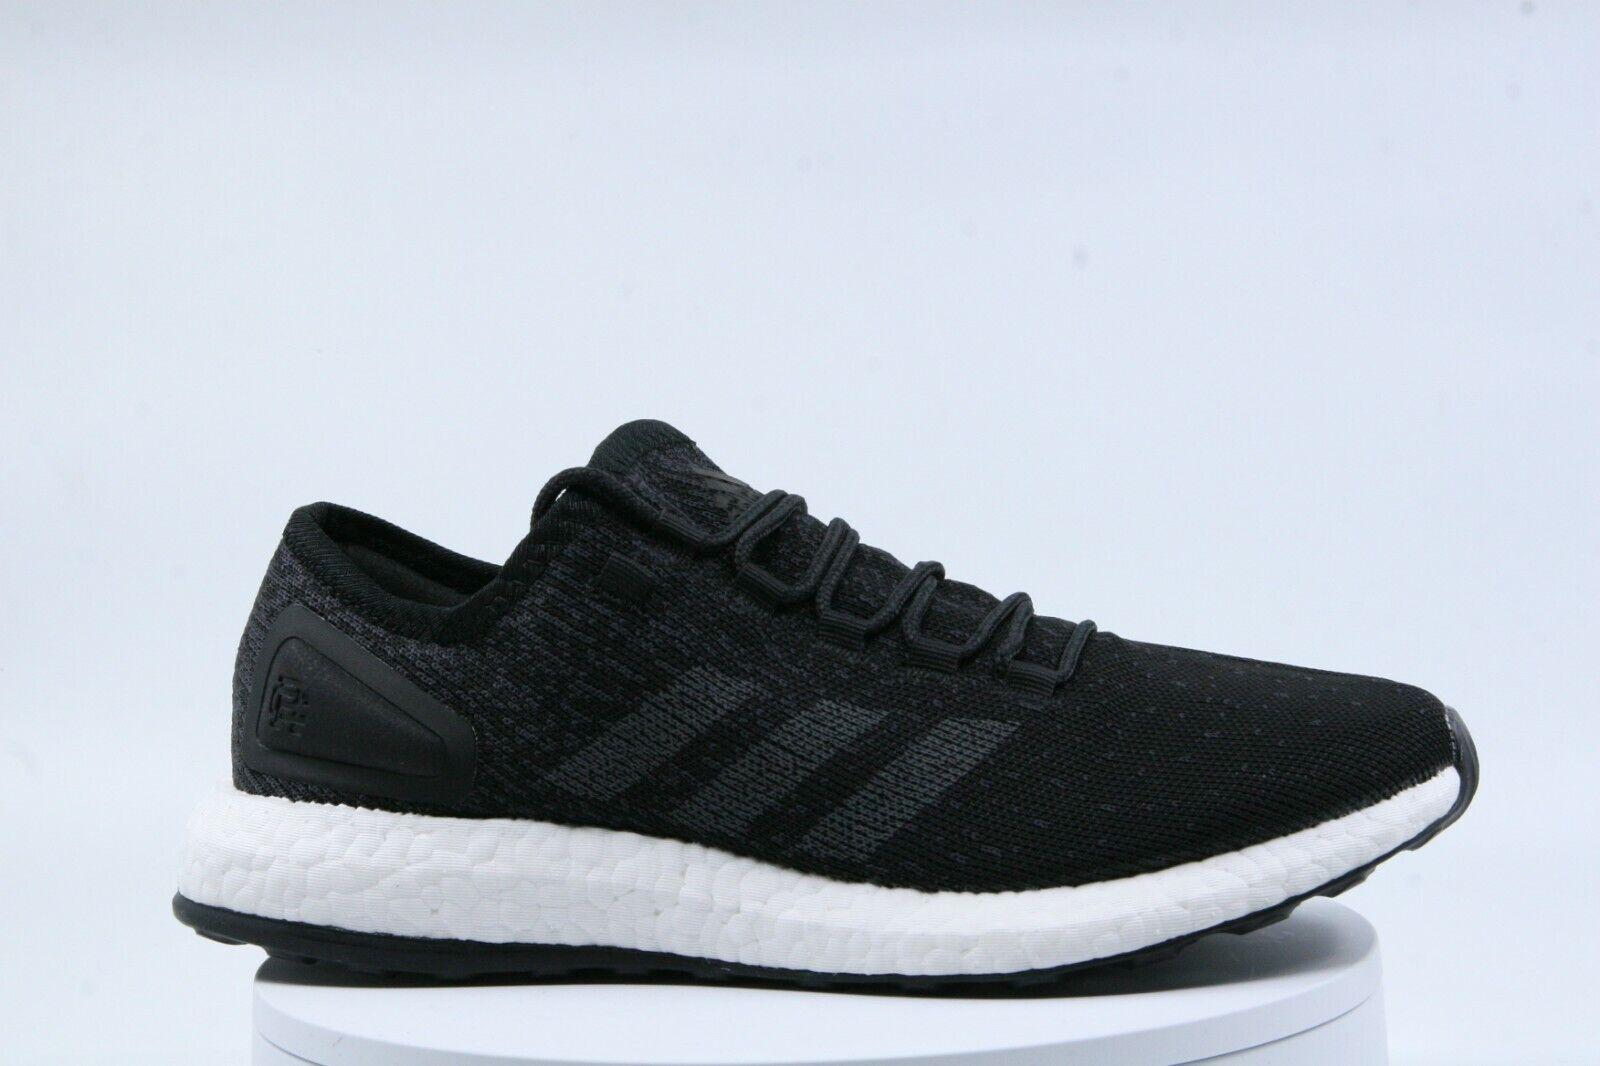 Adidas x Reigning Reigning Reigning Champ Men's PureBOOST shoes Black Primeknit 8.5M CG5331 146100